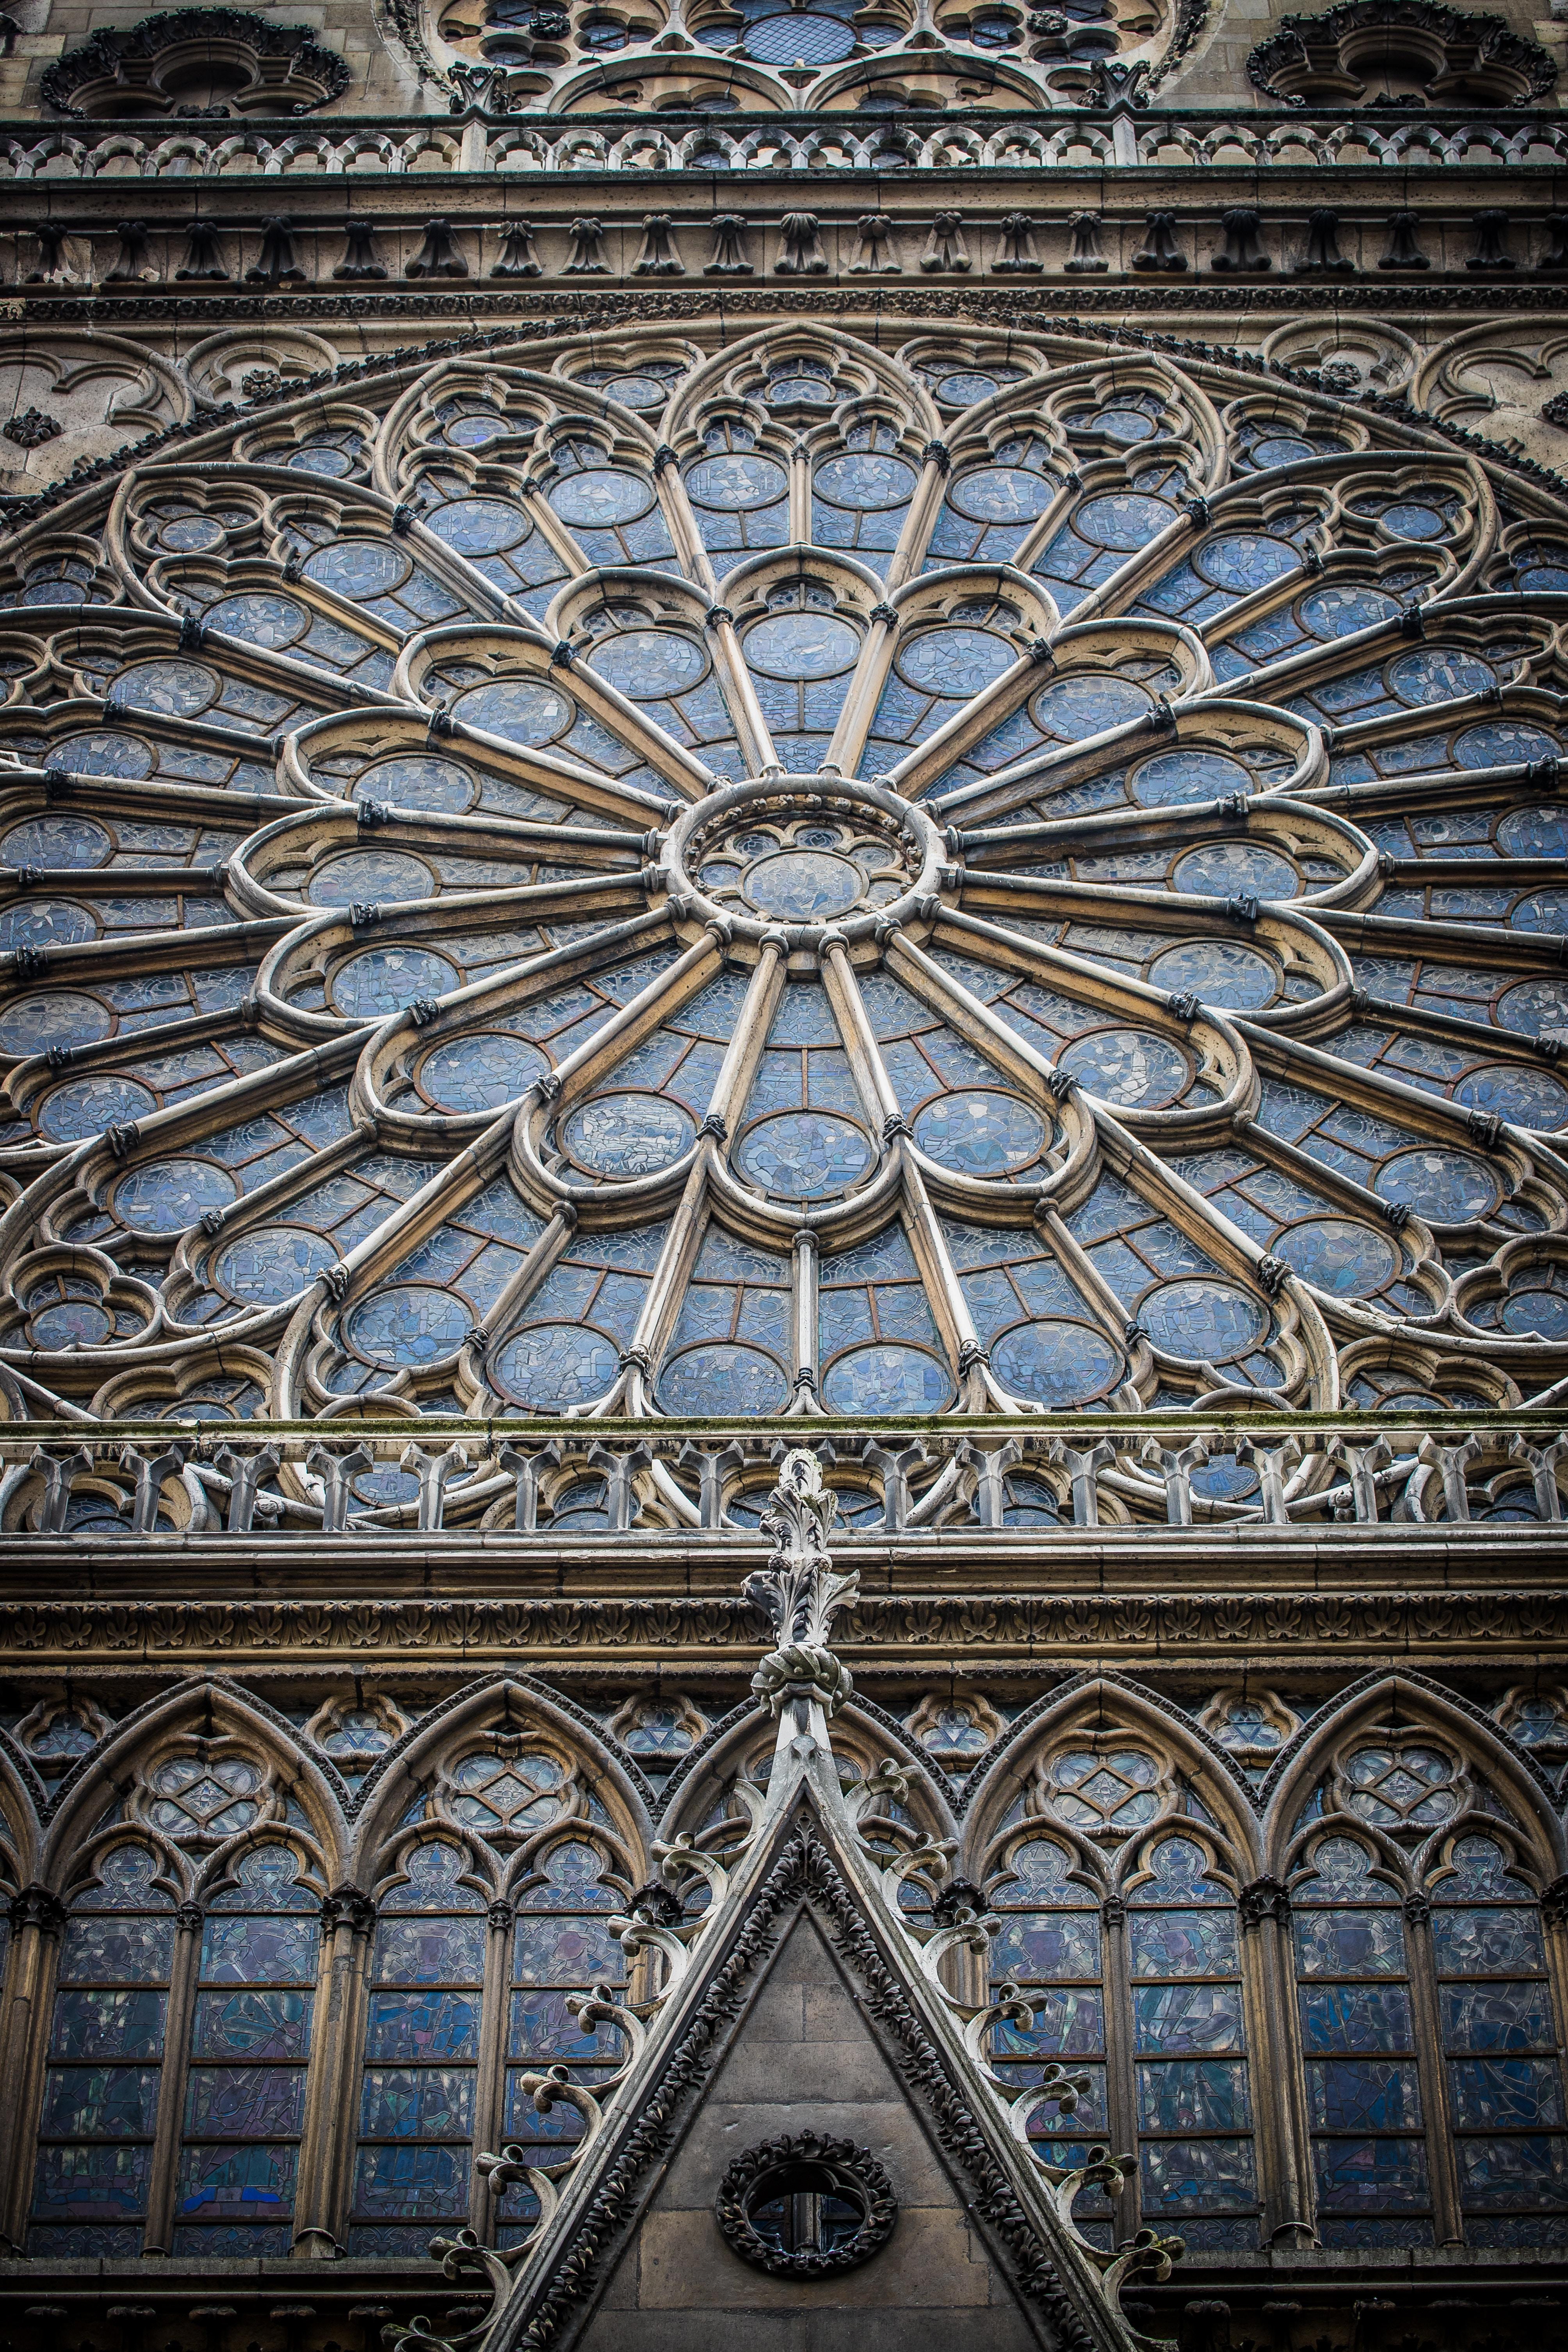 Det norra rosettfönstret på Notre-Dame, från omkring år 1250. Foto: Stephanie LeBlanc via Unsplash